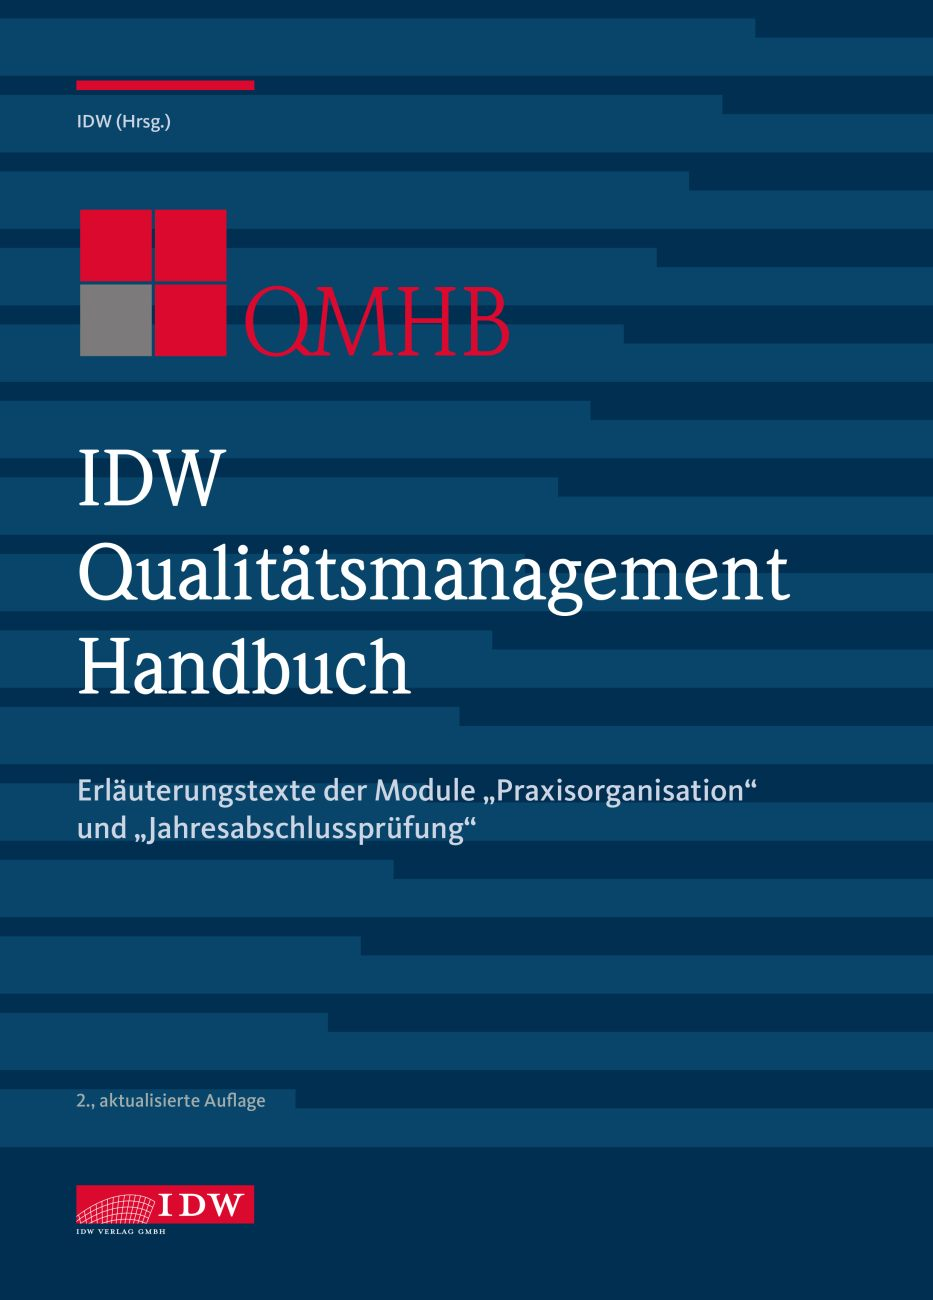 IDW Qualitätsmanagement Handbuch (QMHB)